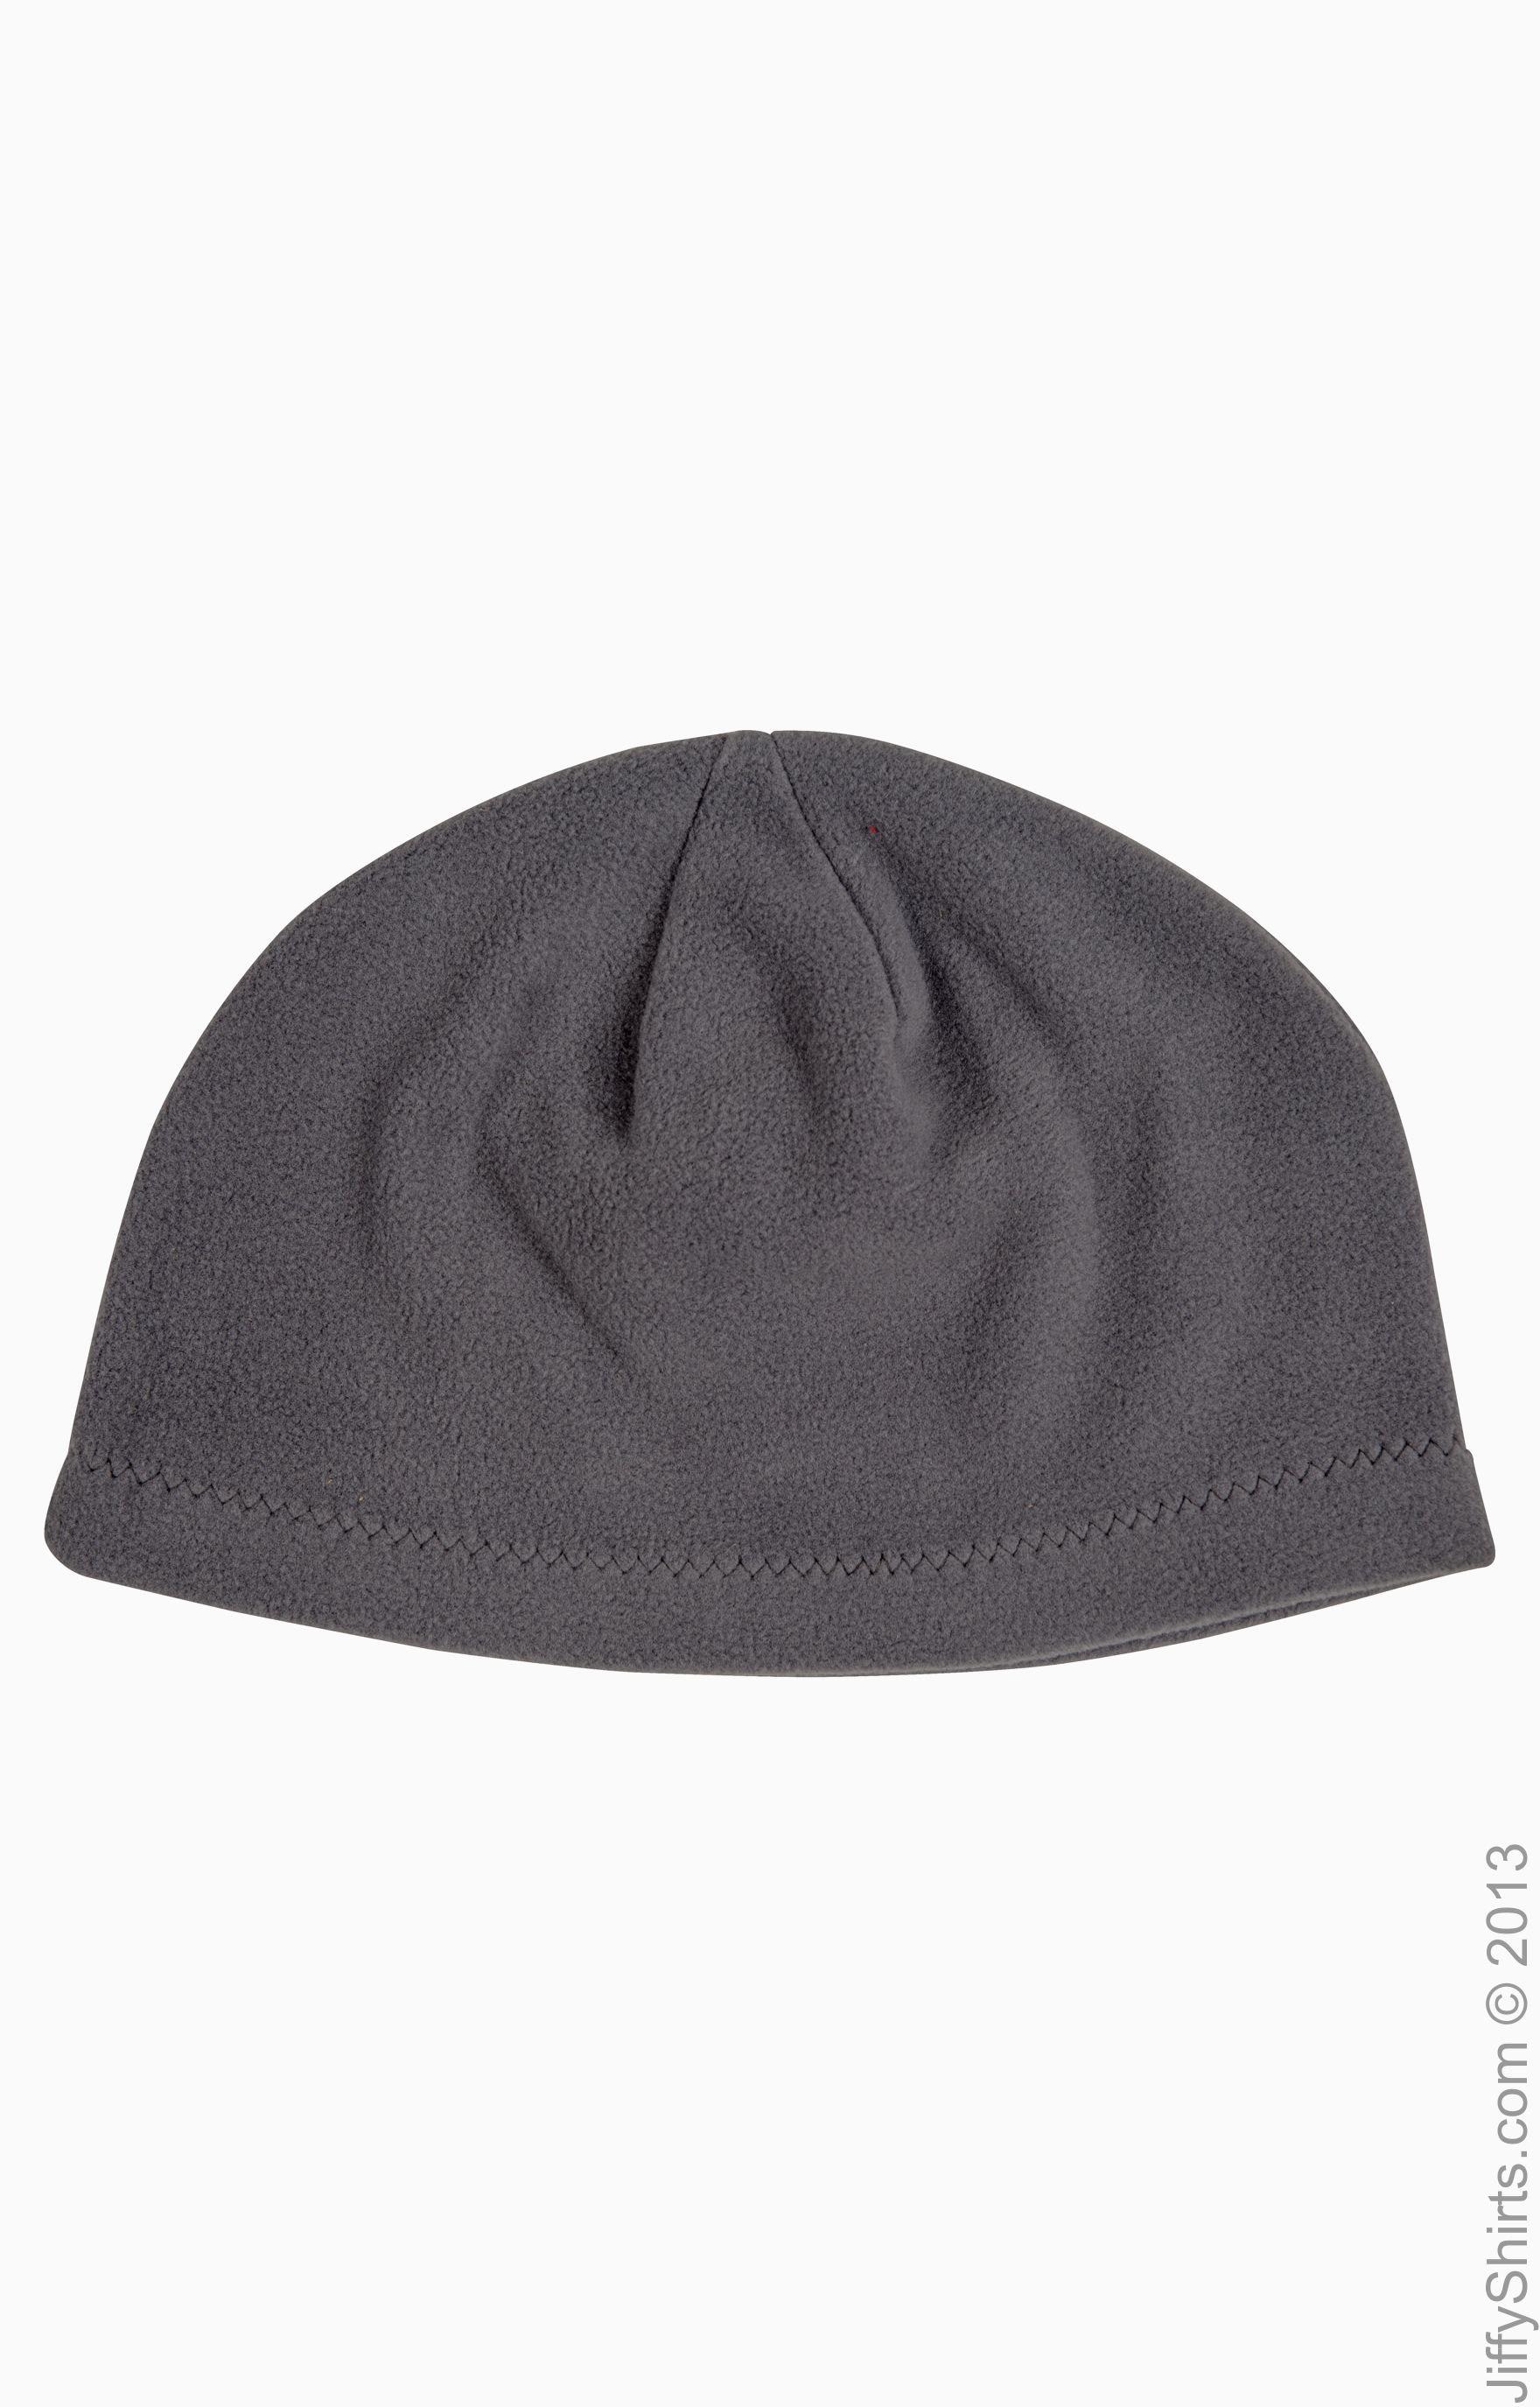 BX013 - Grey